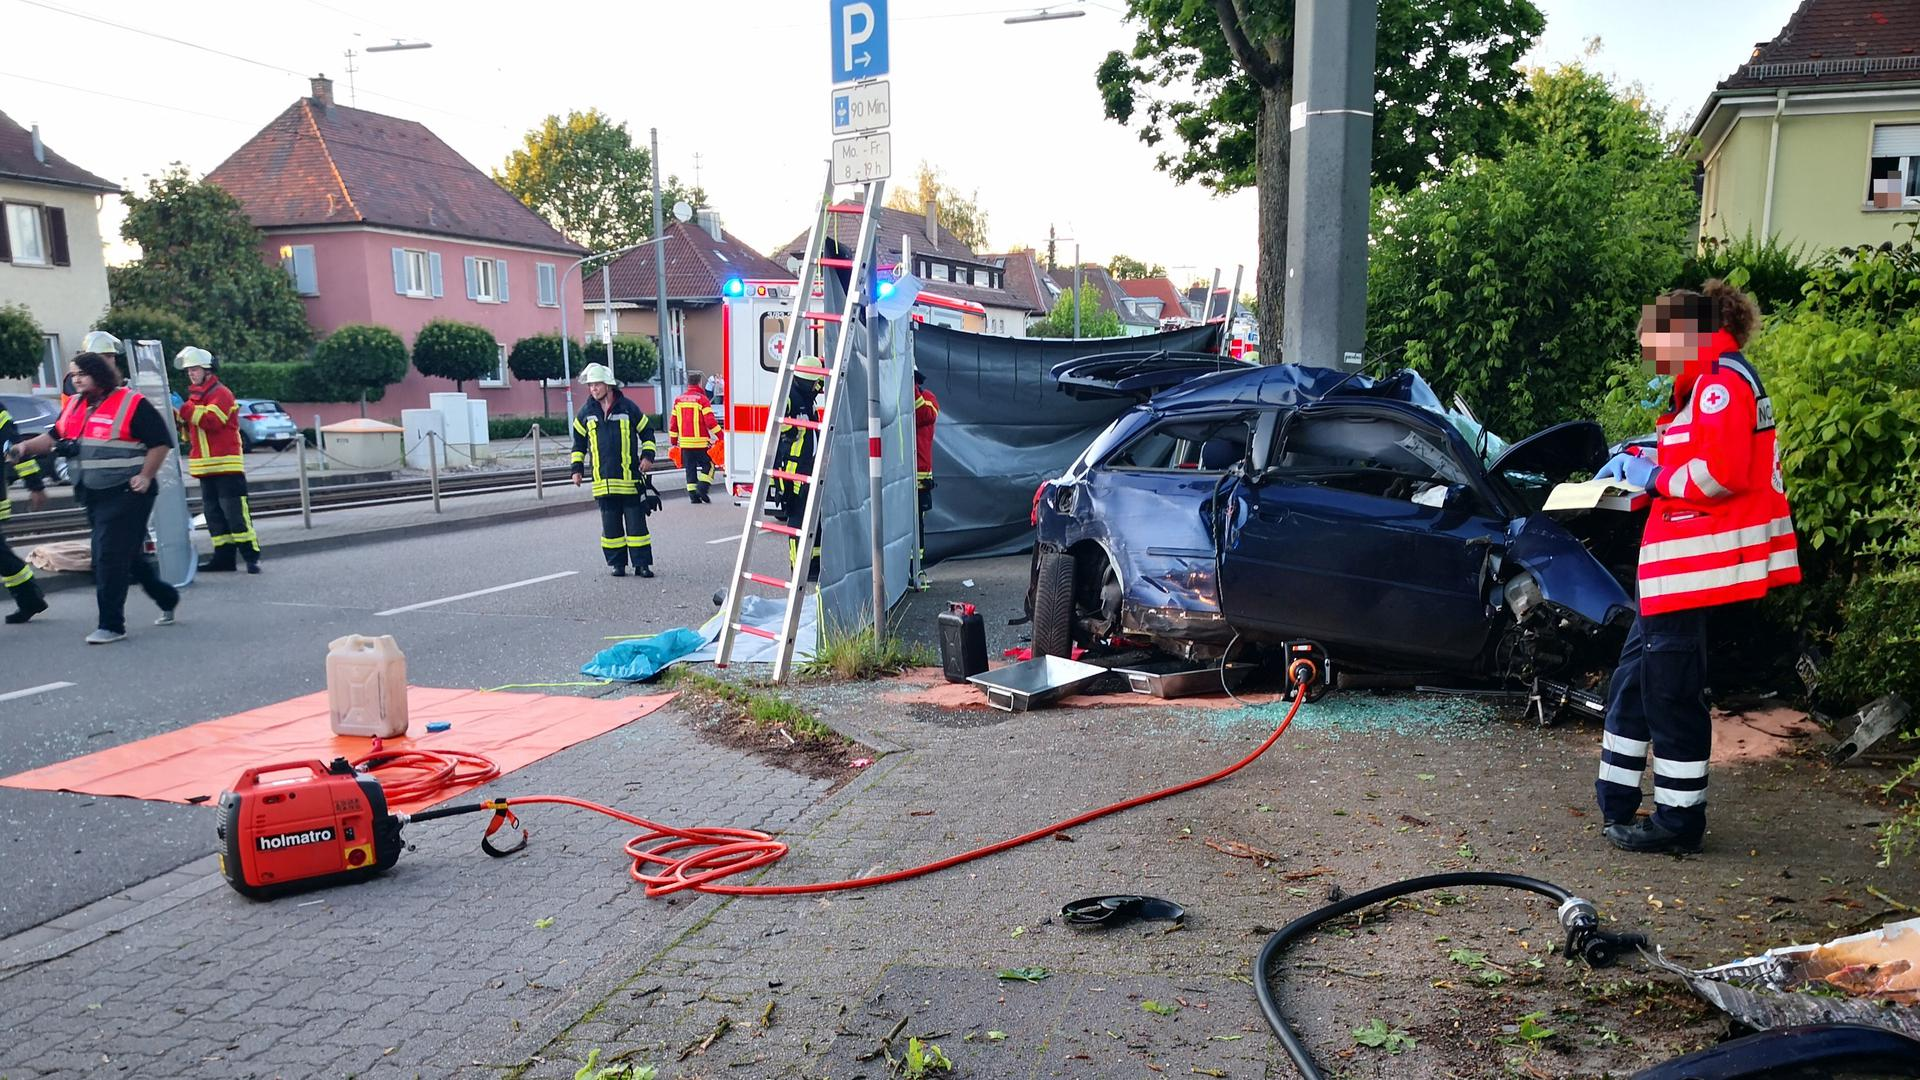 Nachrichten Karlsruhe Unfall Heute